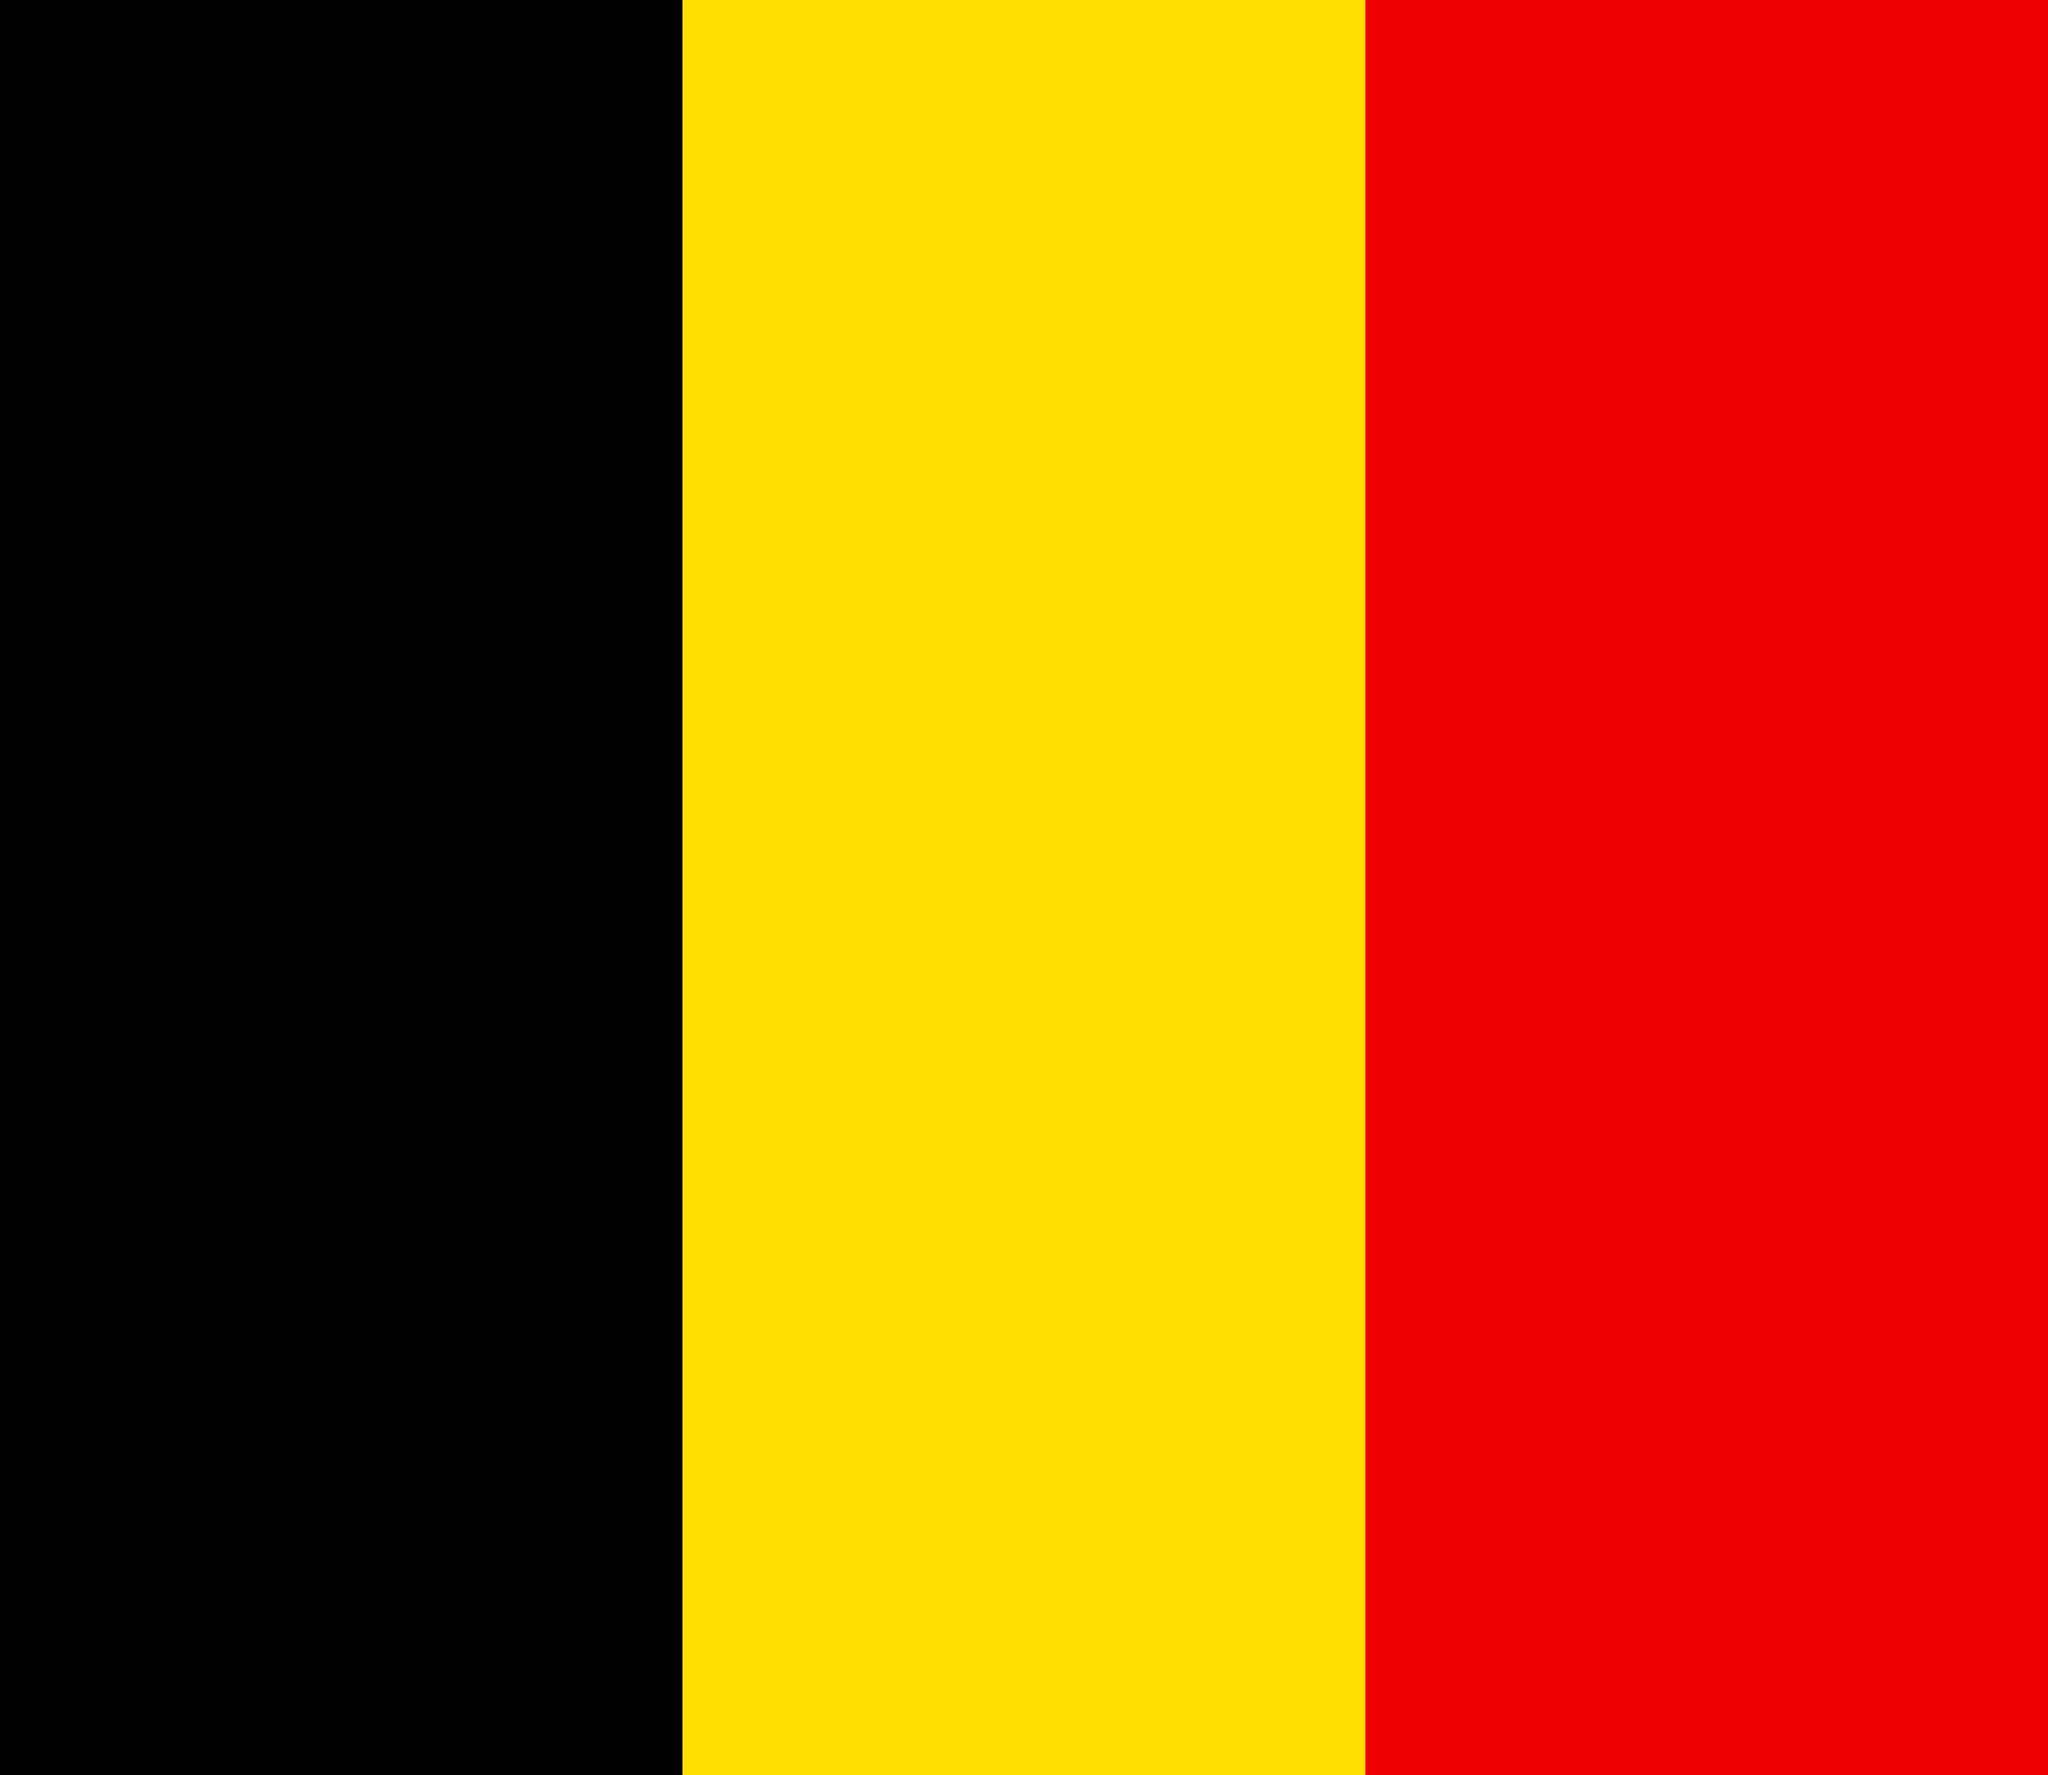 drapeau de la belgique - Drapeau Espagnol A Imprimer